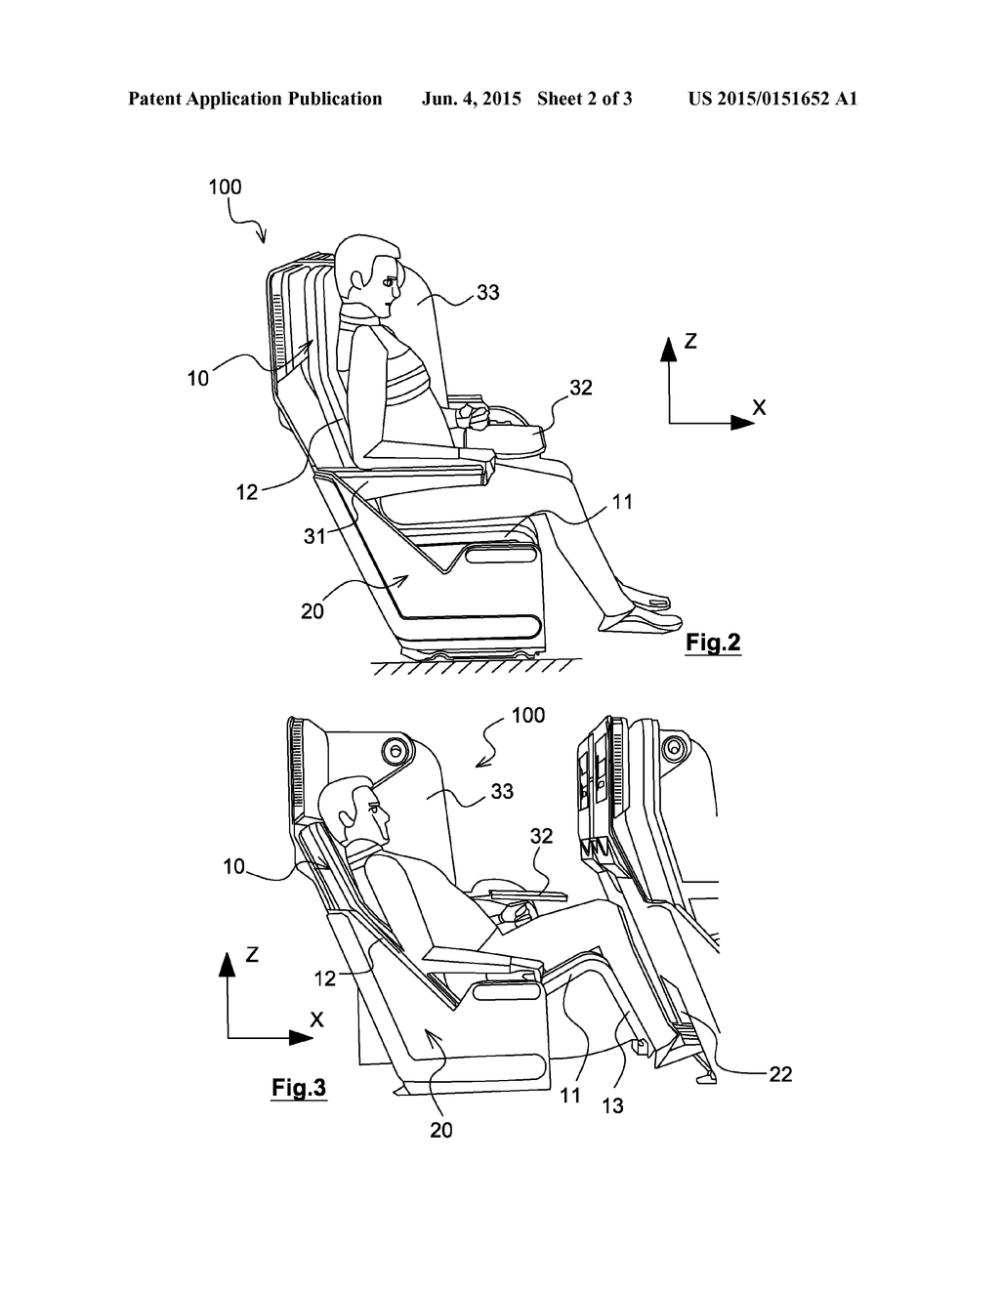 medium resolution of passenger seat having a bucket seat structure and adjustable 1978 corvette seat diagram passenger seat having